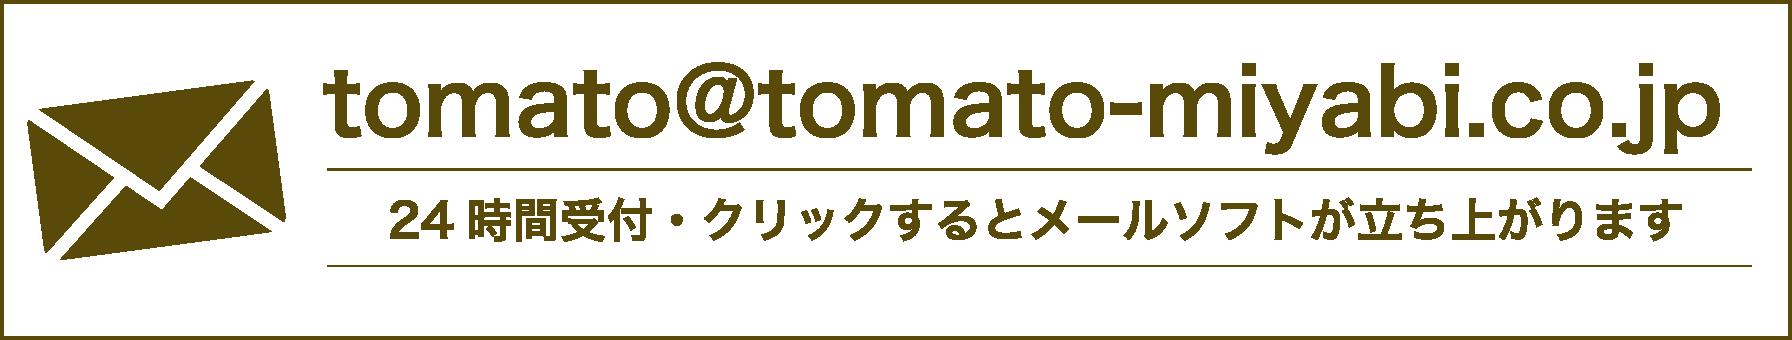 tomato@tomato-miyabi.co.jp